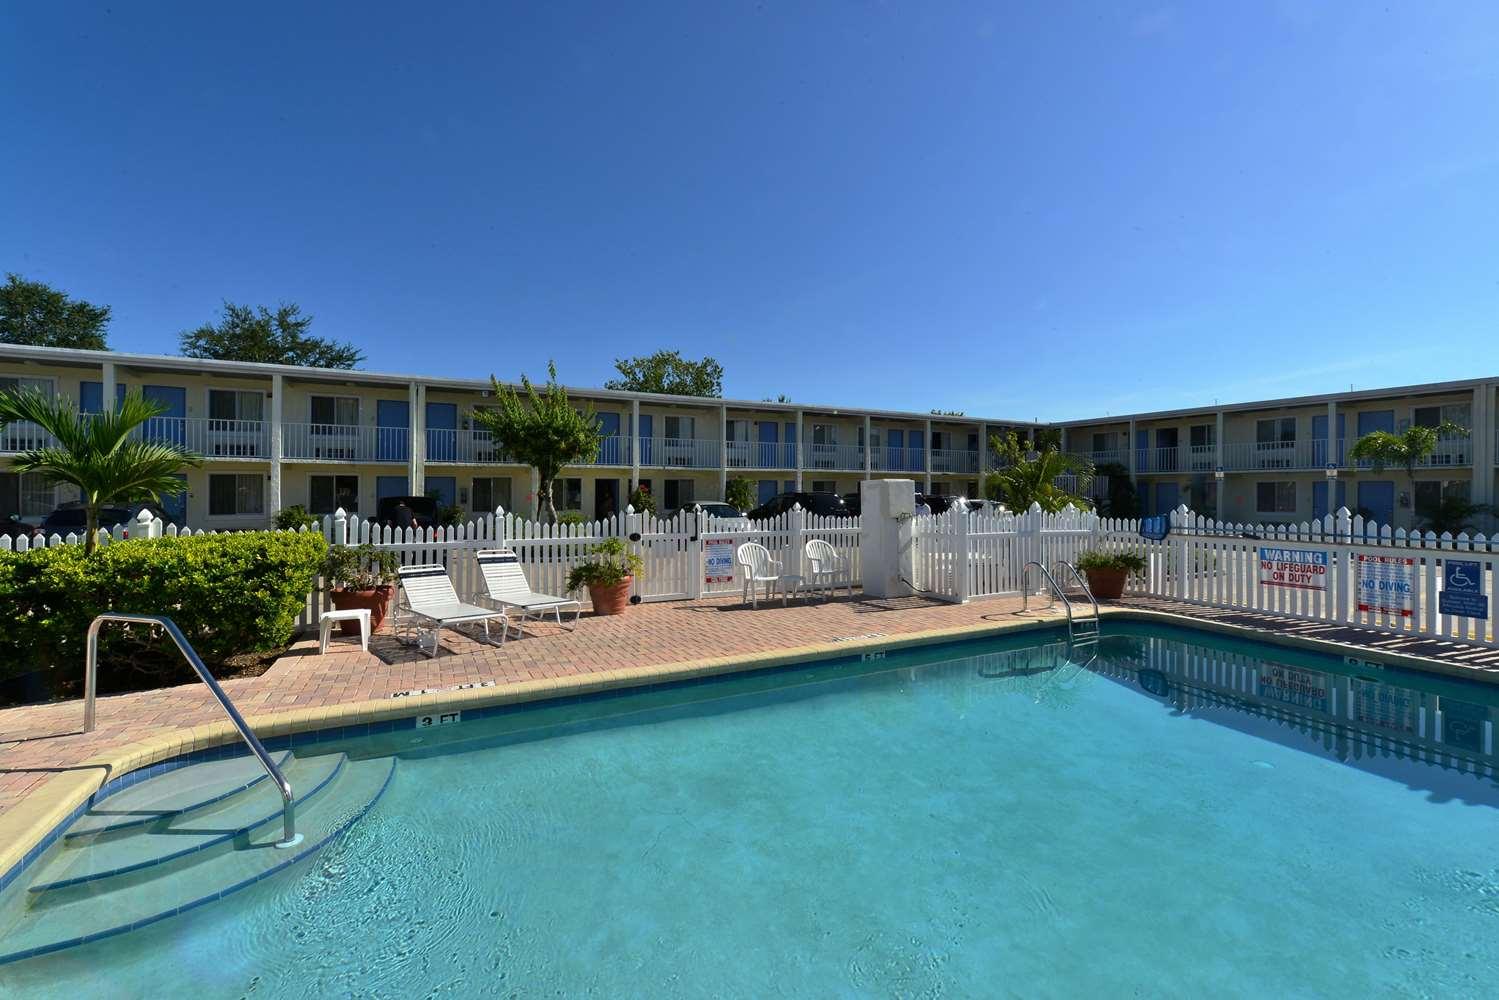 Americas best value inn east bradenton fl see discounts - Public swimming pools sarasota fl ...